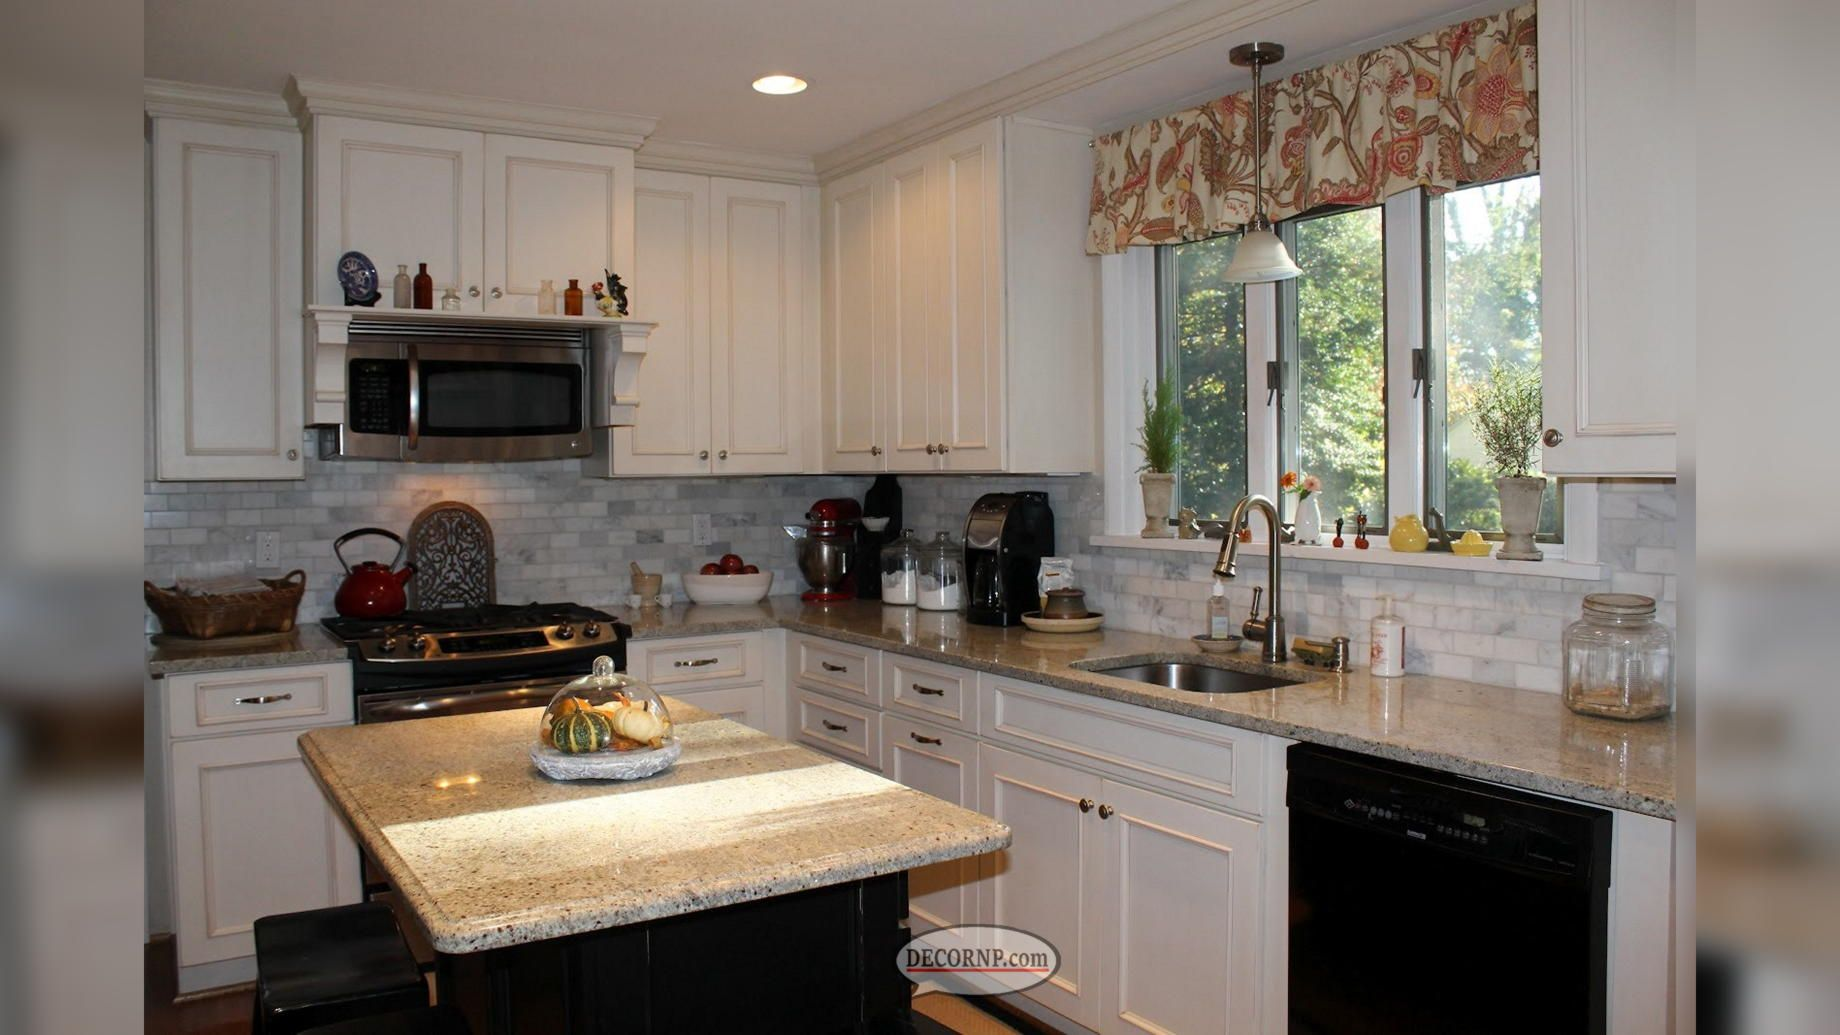 Replace Kitchen Cabinet Doors Or Reface Them | DecorNP ...